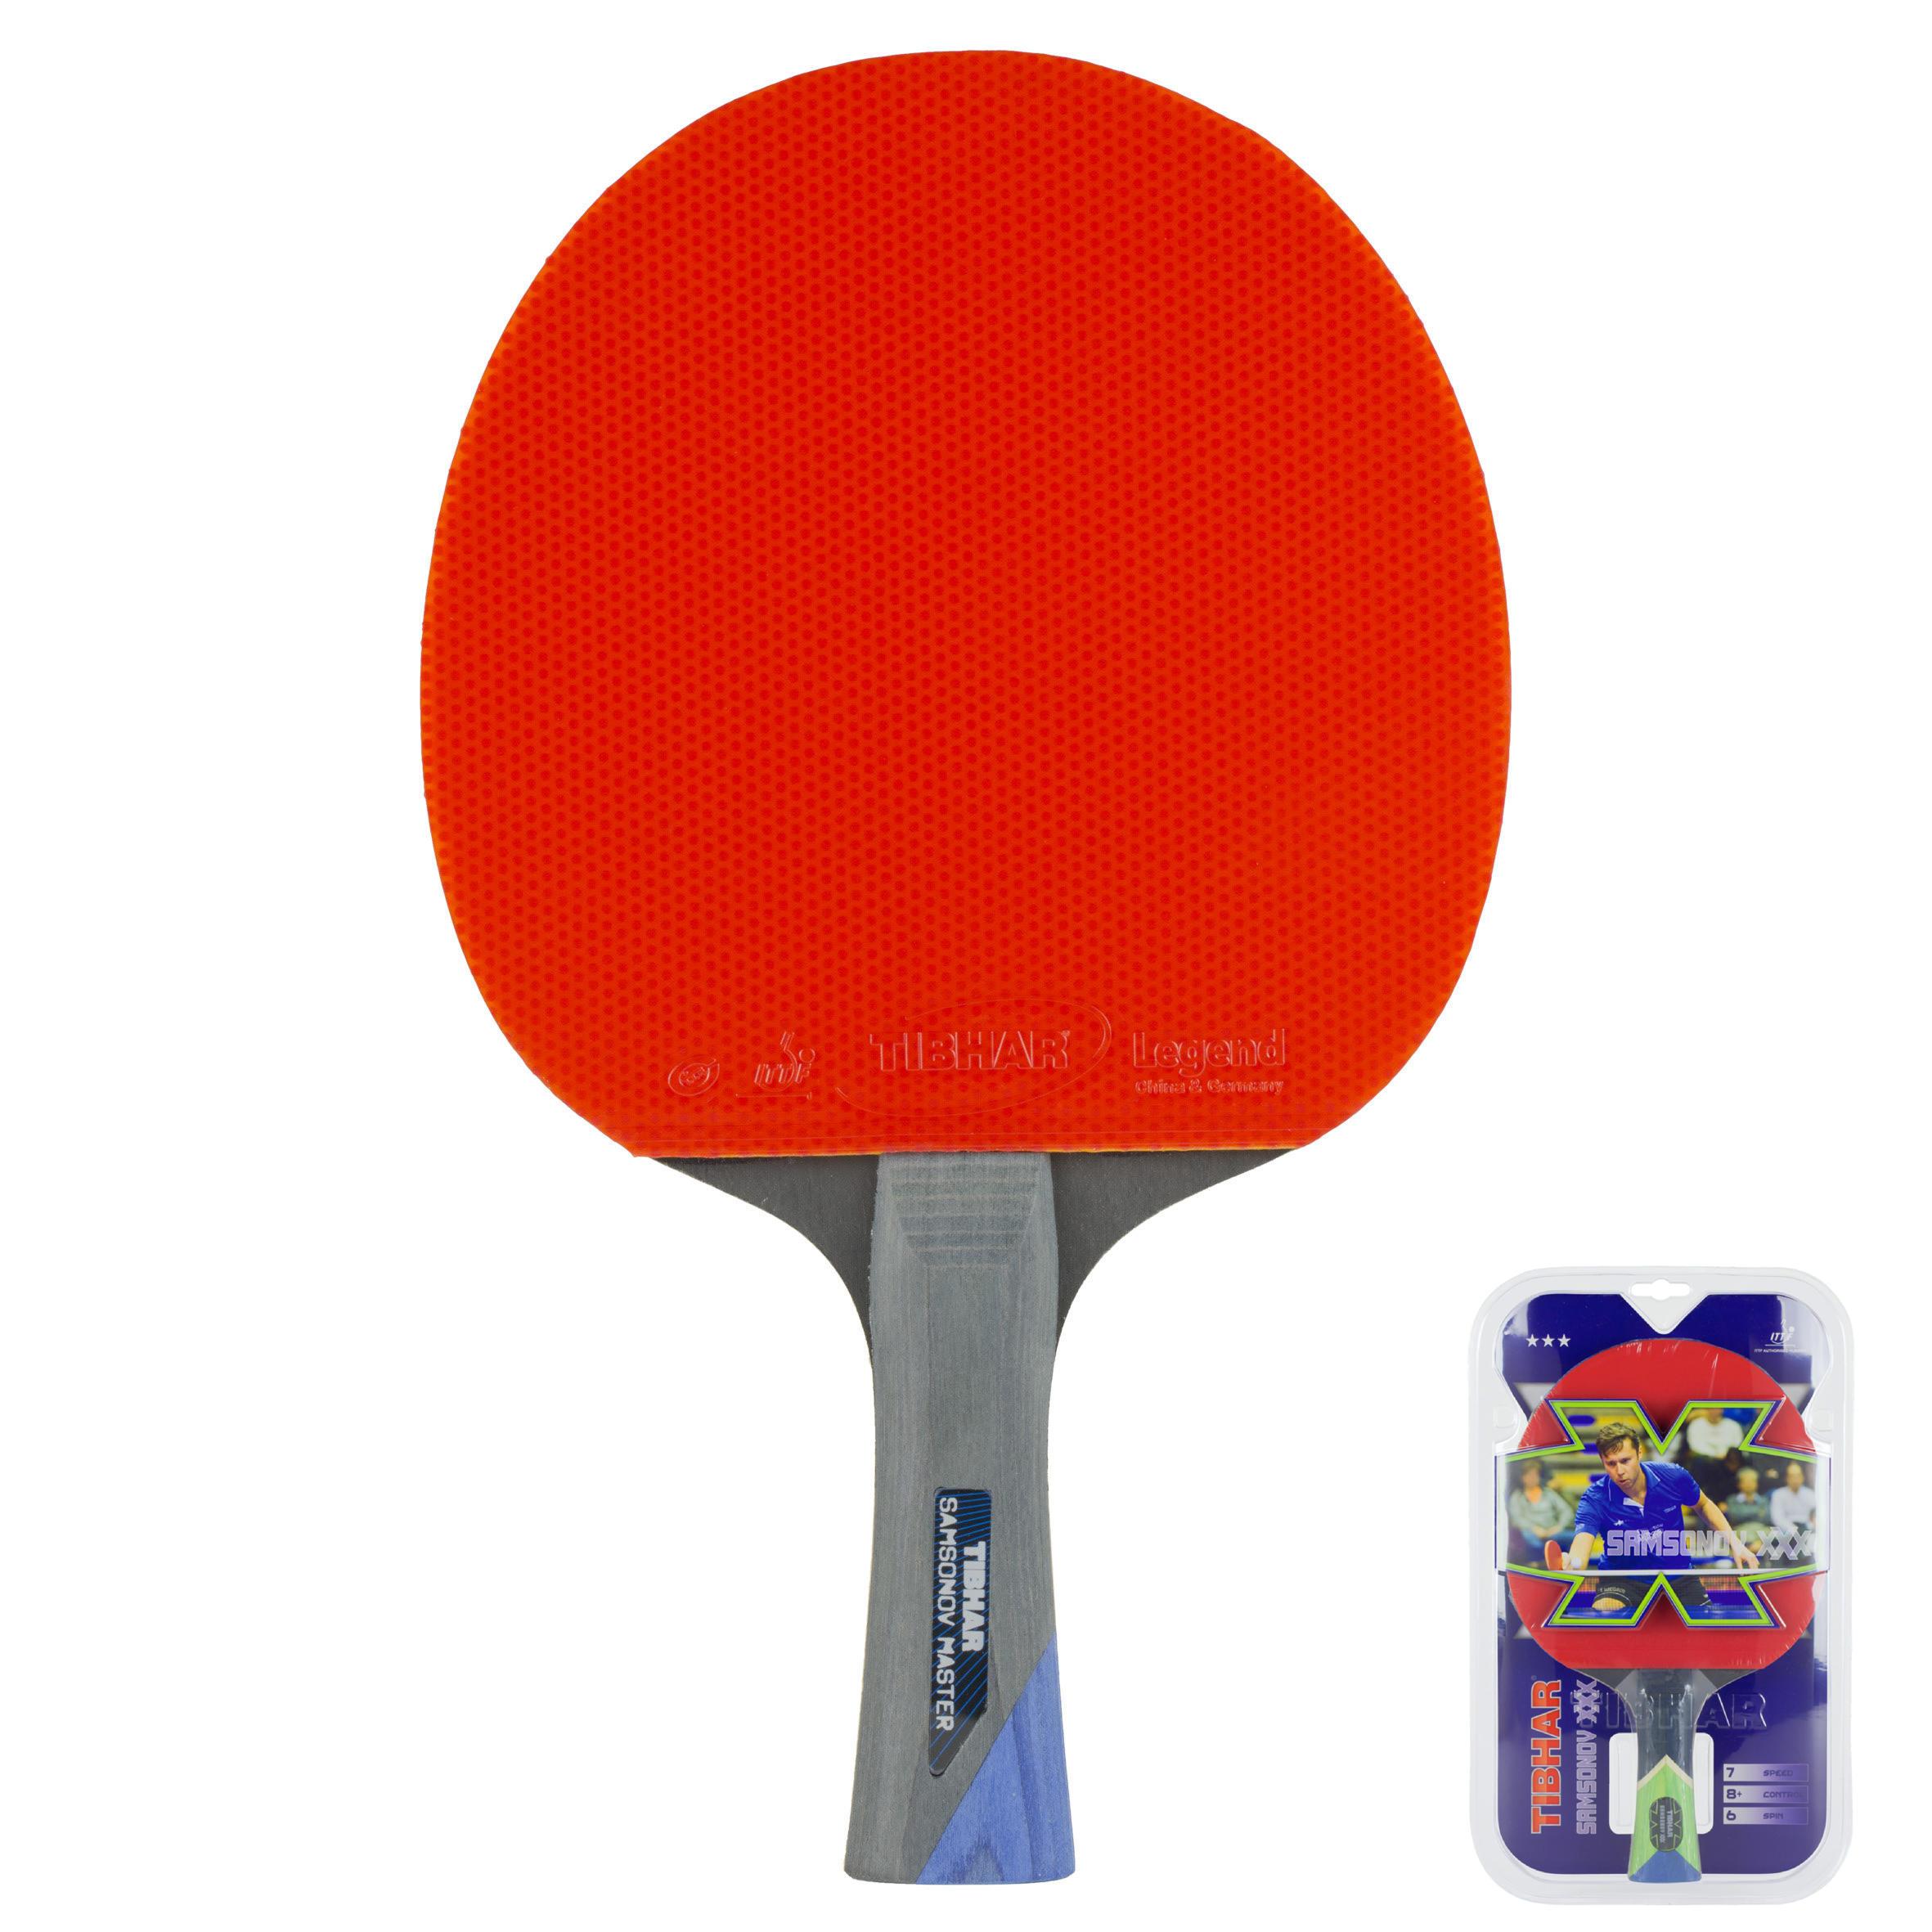 Paletă Tenis Master 3* imagine